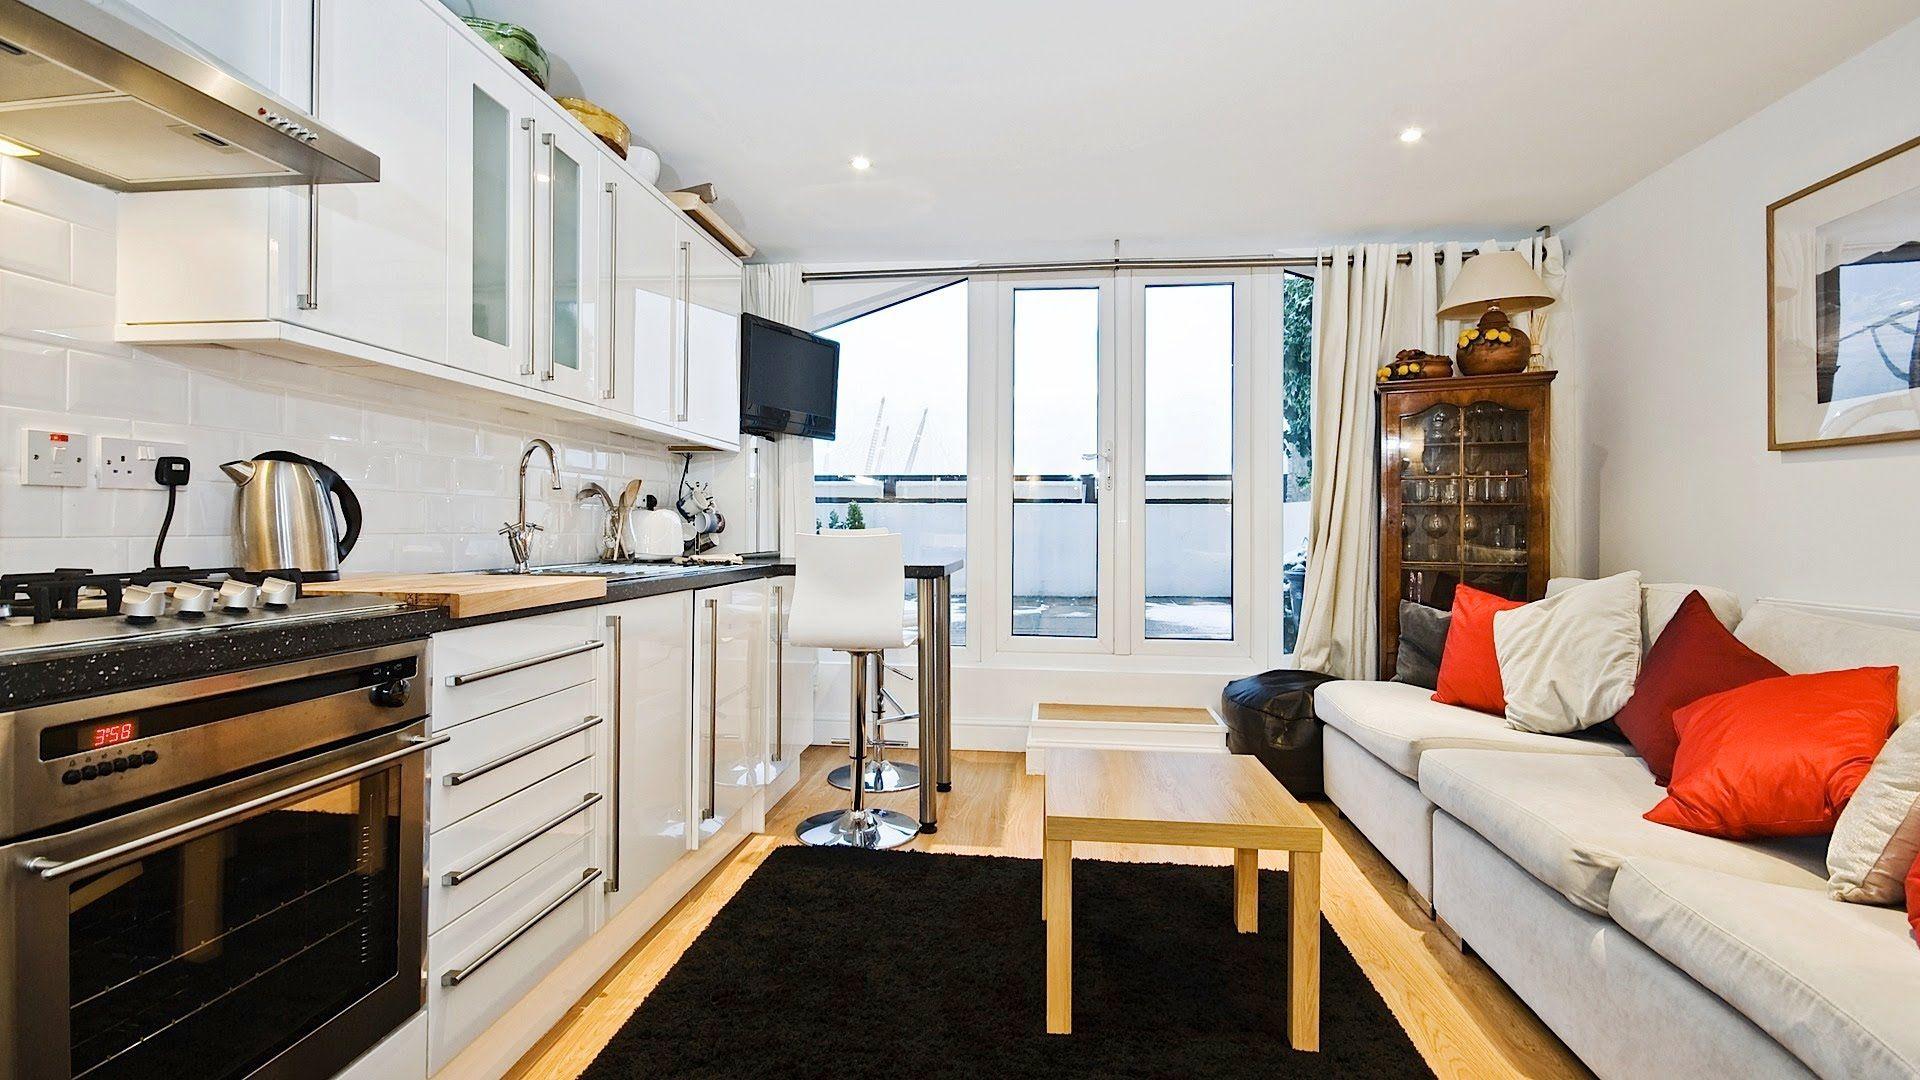 Exclusive Image Of Apartment Furniture